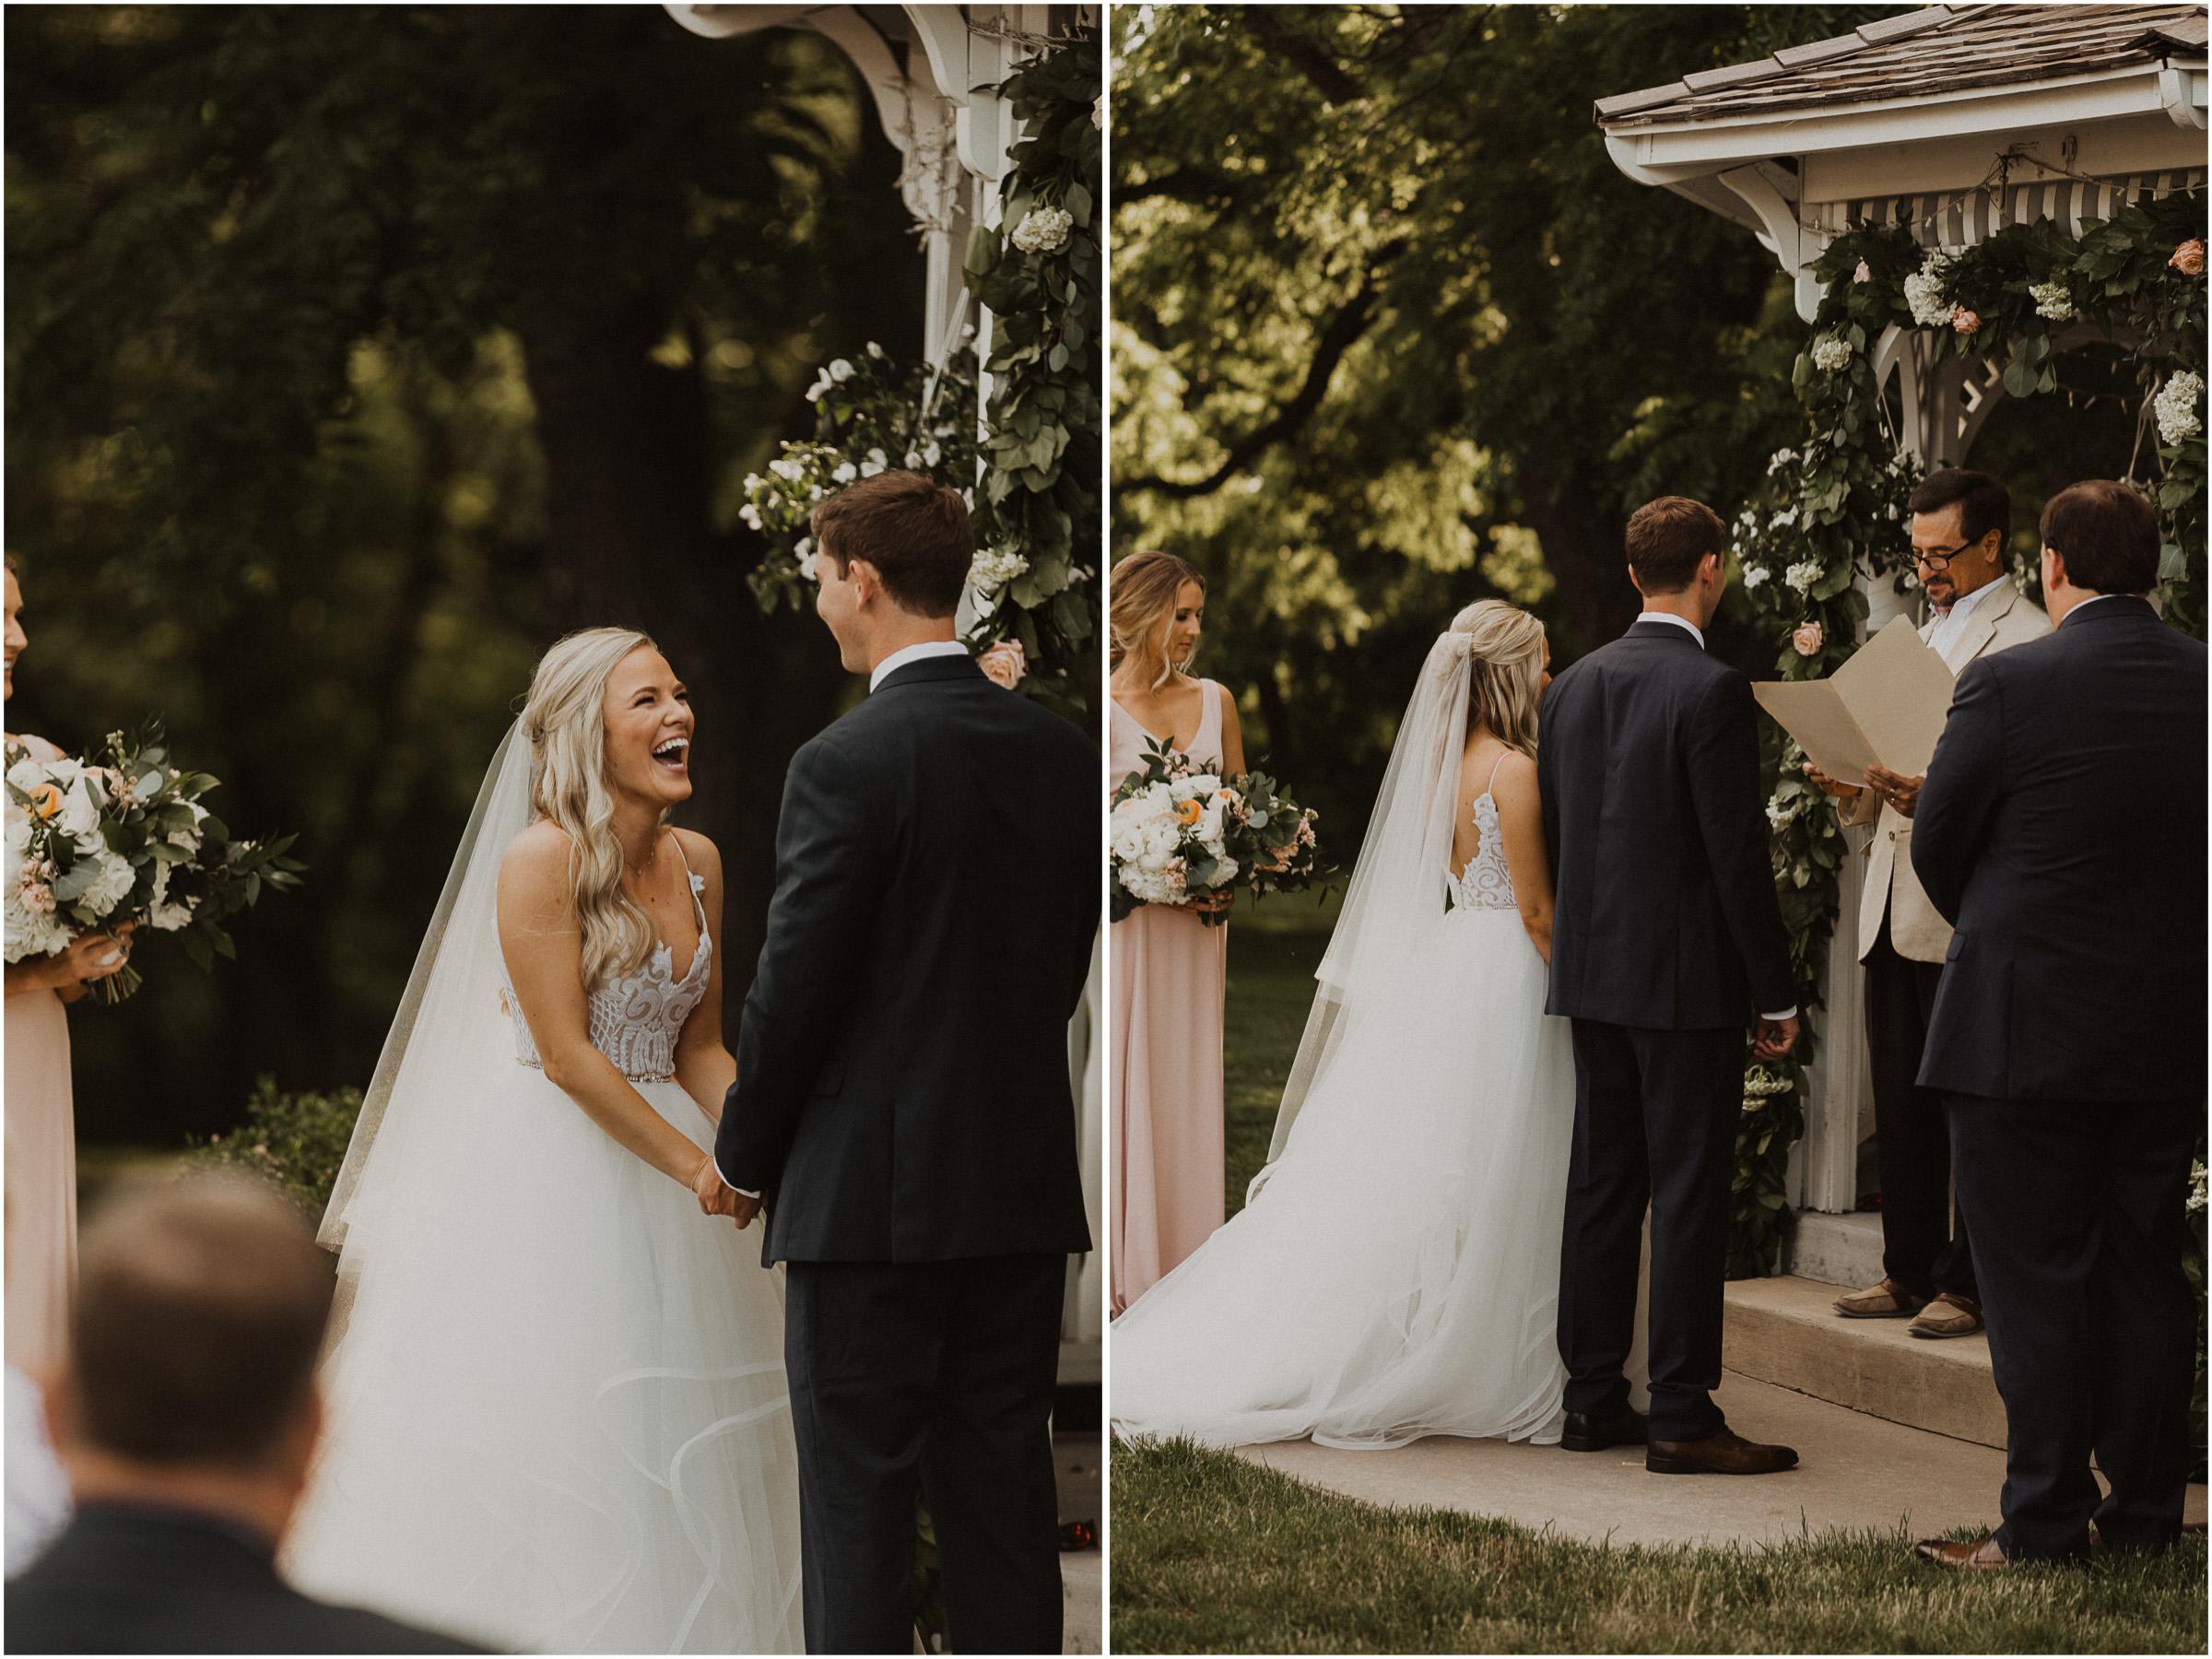 alyssa barletter photography hawthorne house summer outdoor wedding southern charm inspiration-48.jpg